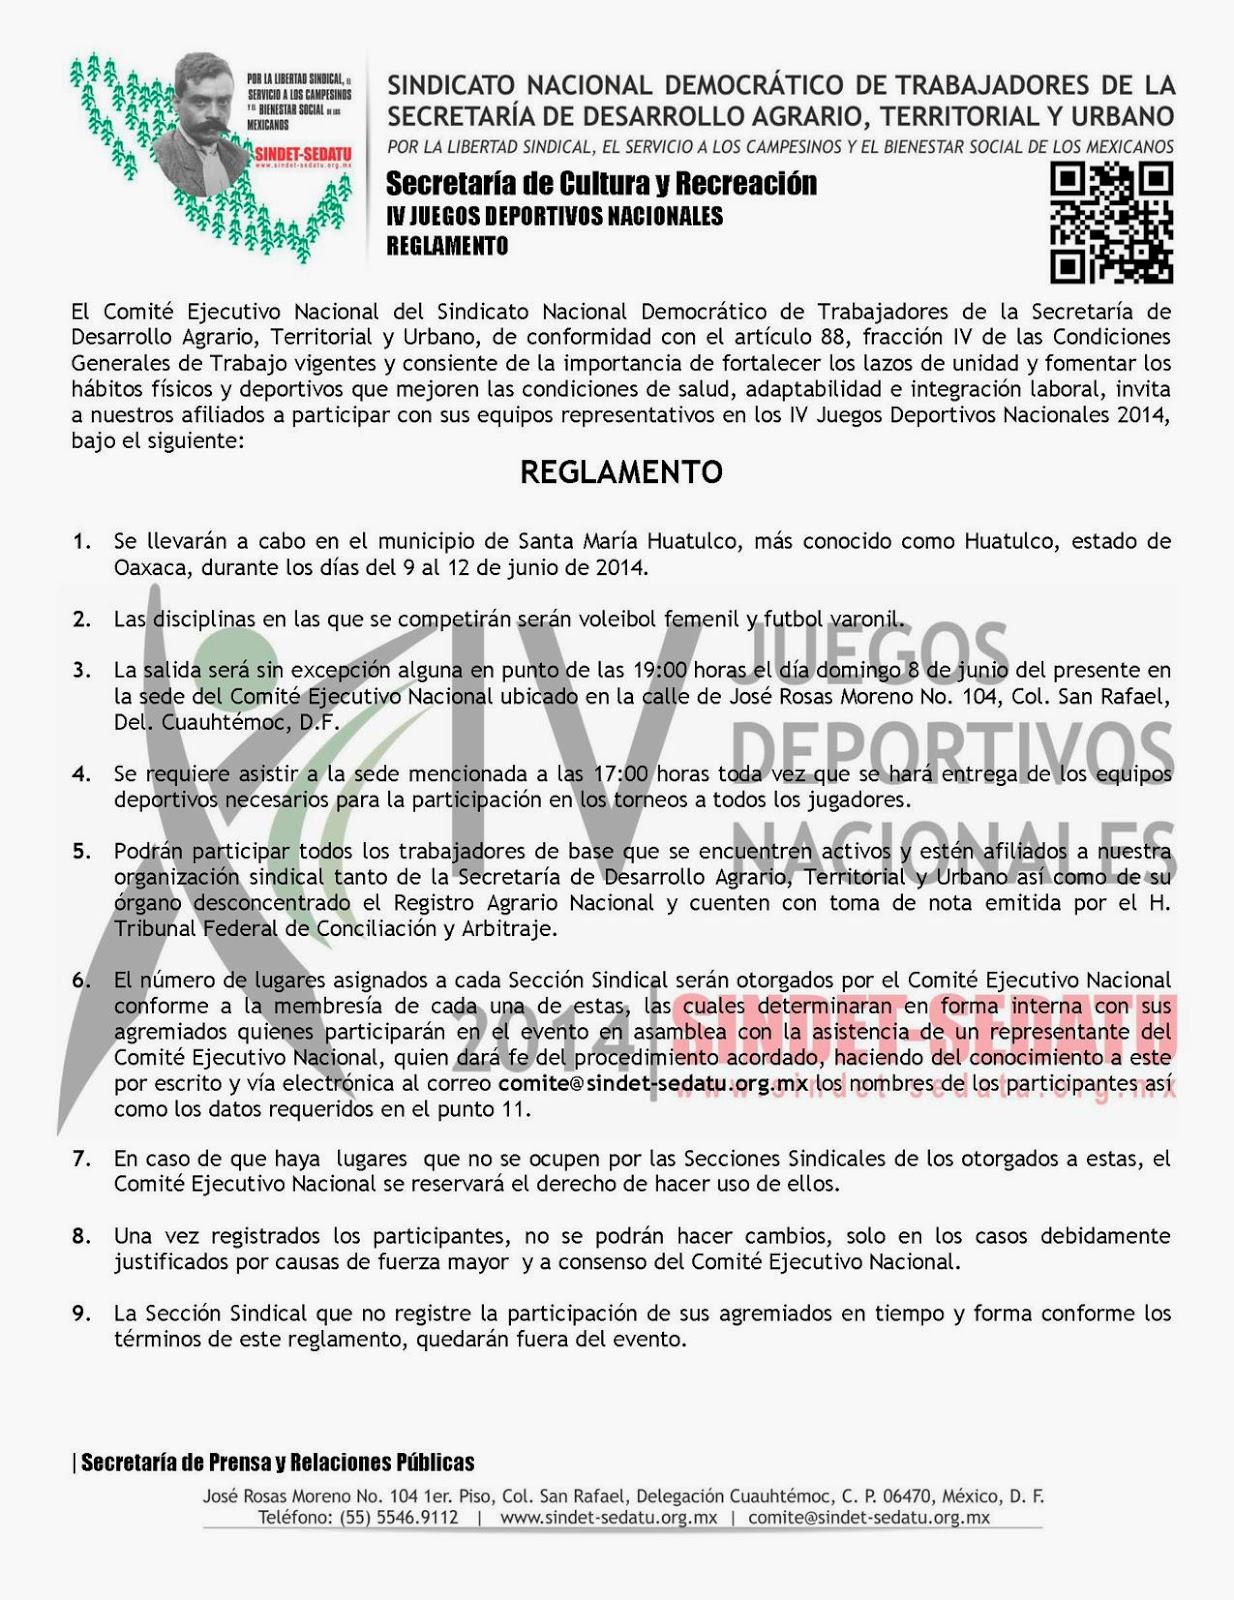 http://sindet-sedatu.org.mx/web/doctos/IV_JDN/IV%20JDN%20SINDET-SEDATU%20-%20Reglamento.pdf